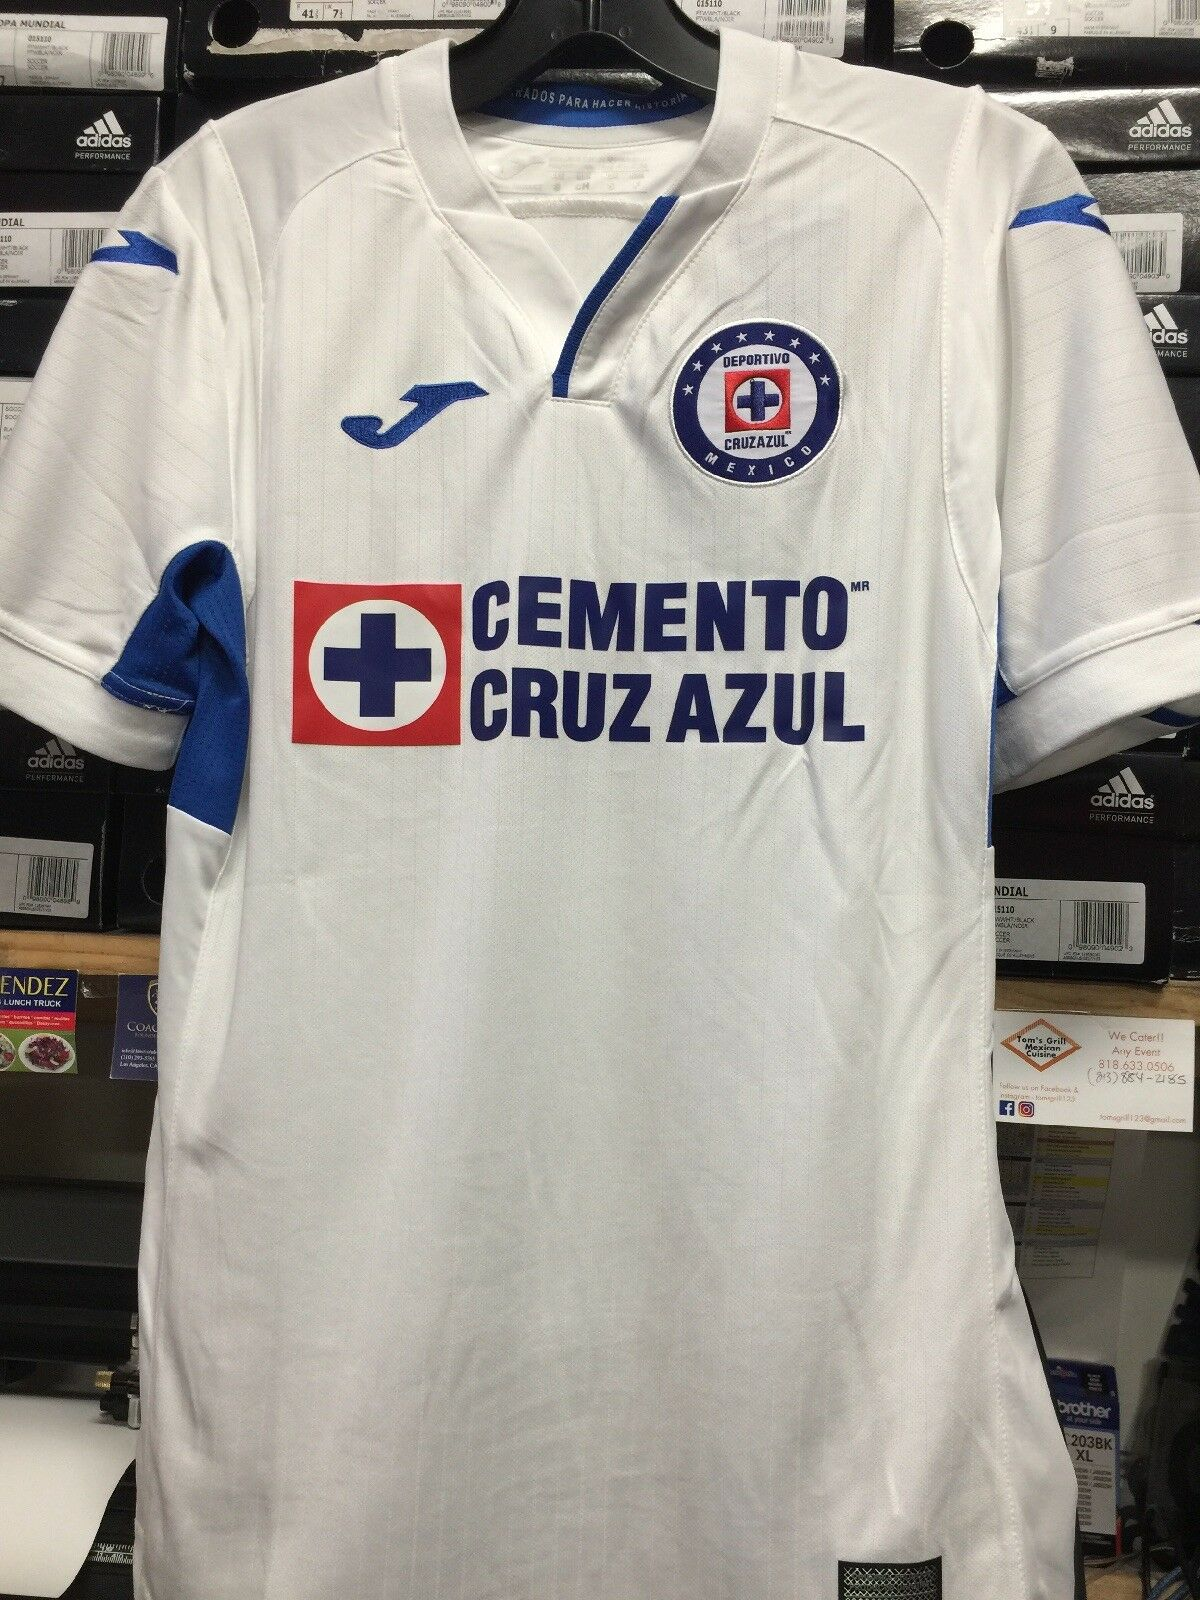 Joma Cruz Azul Lejos Jersey 2019 blancoo Azul Real, Talla S, sólo